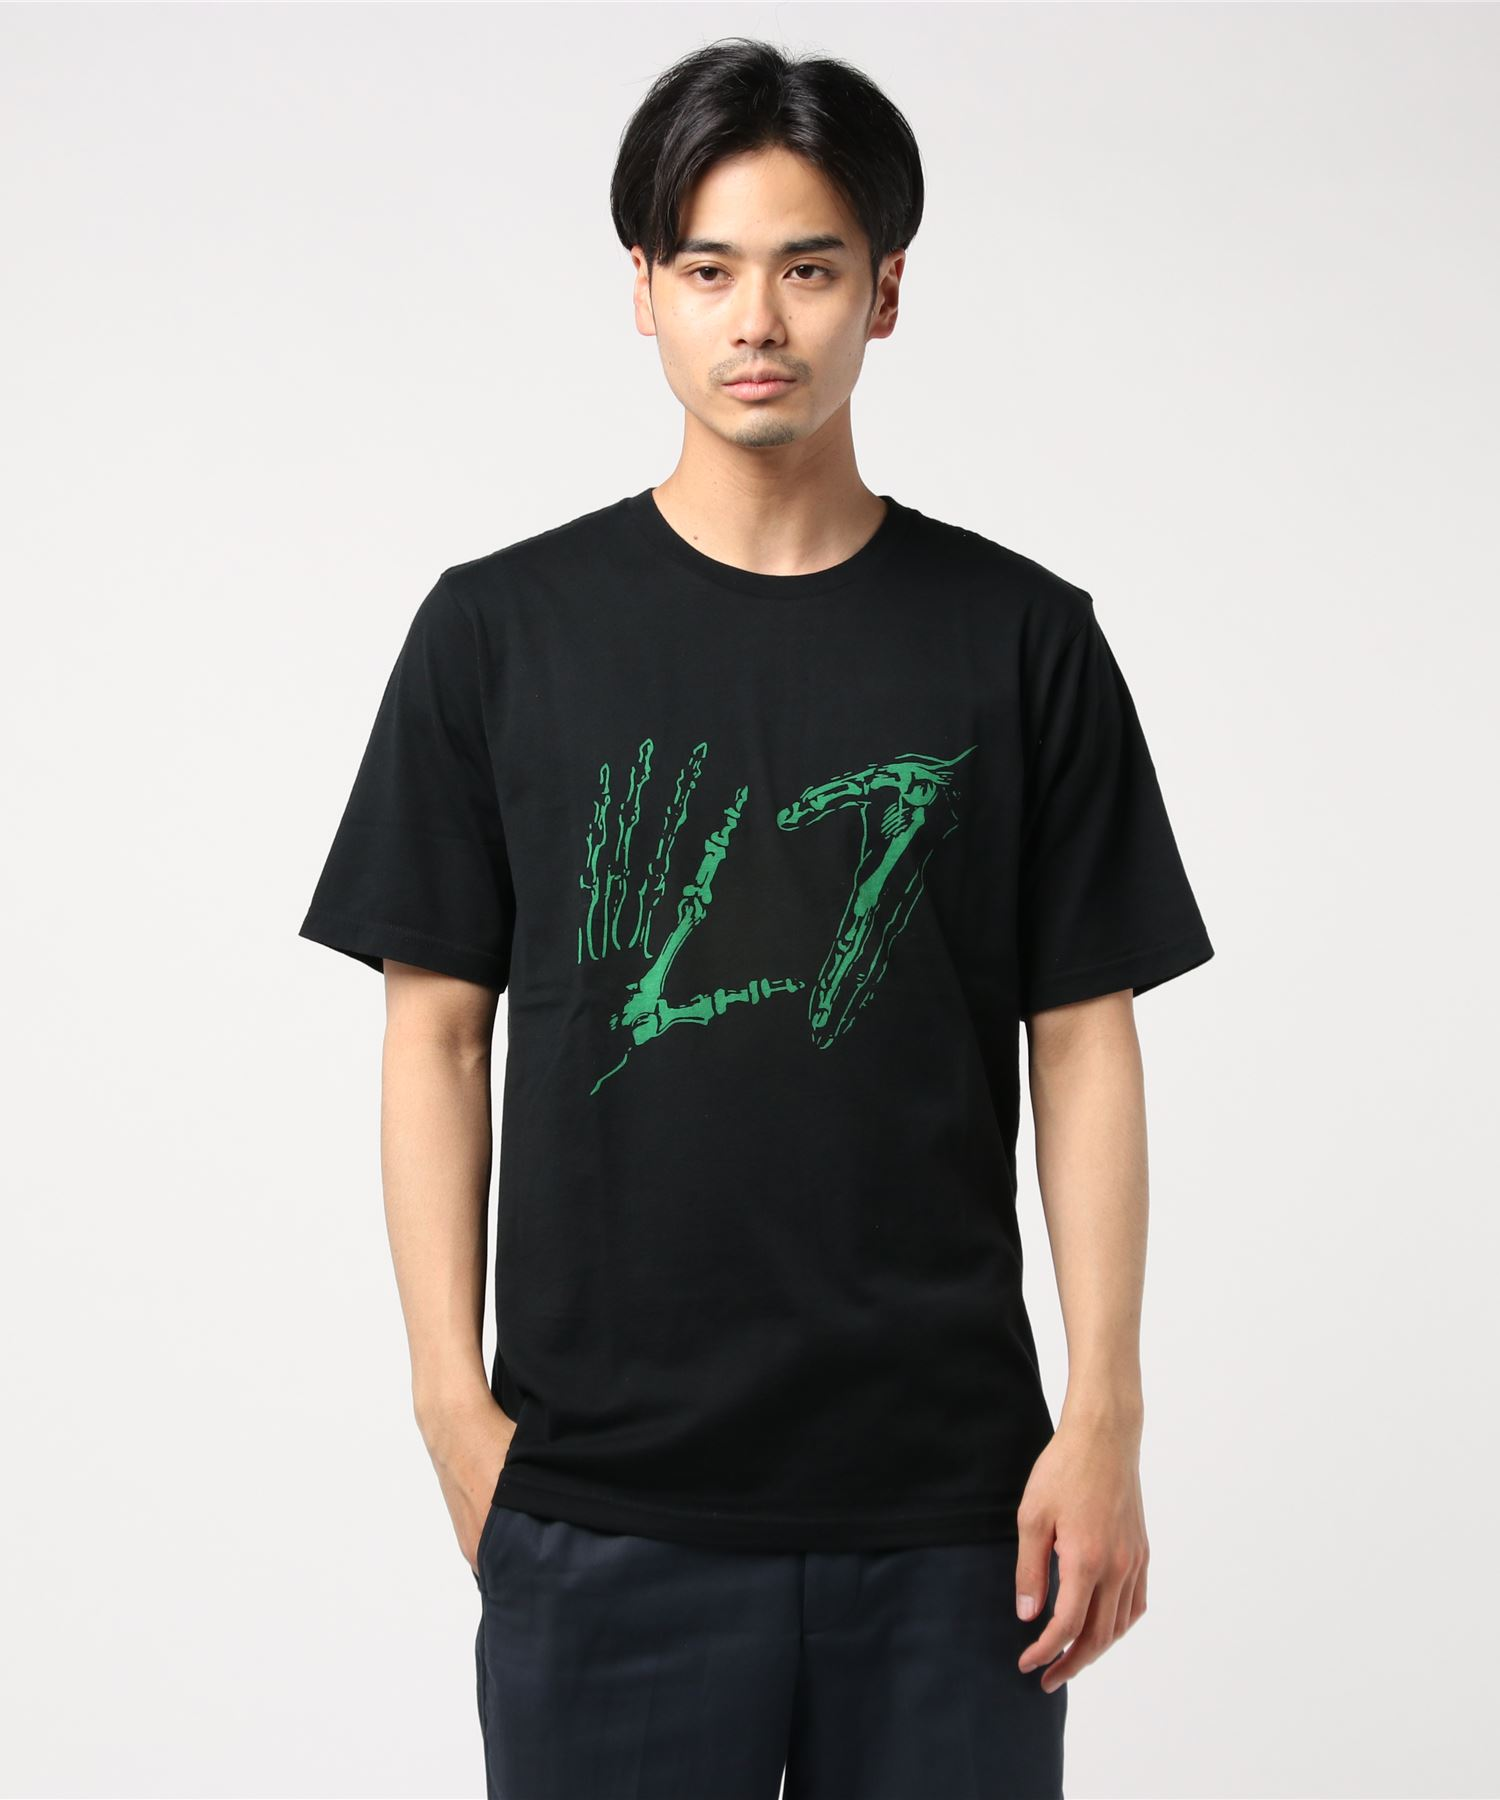 L7/HANDS LOGO pt Tシャツ